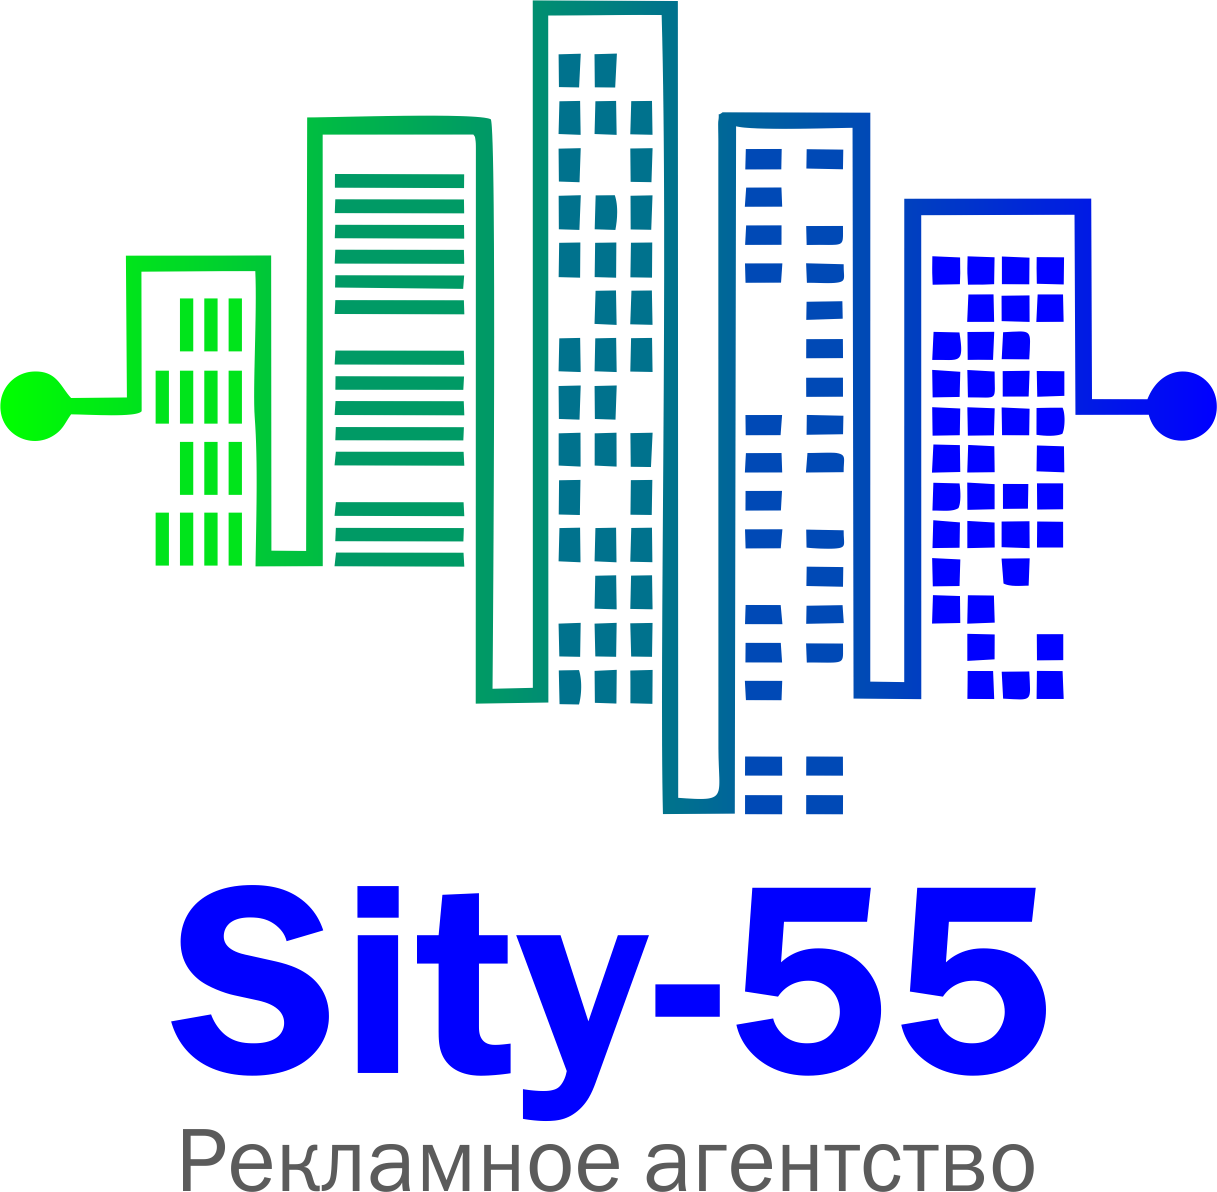 Рекламное агентство Sity-55